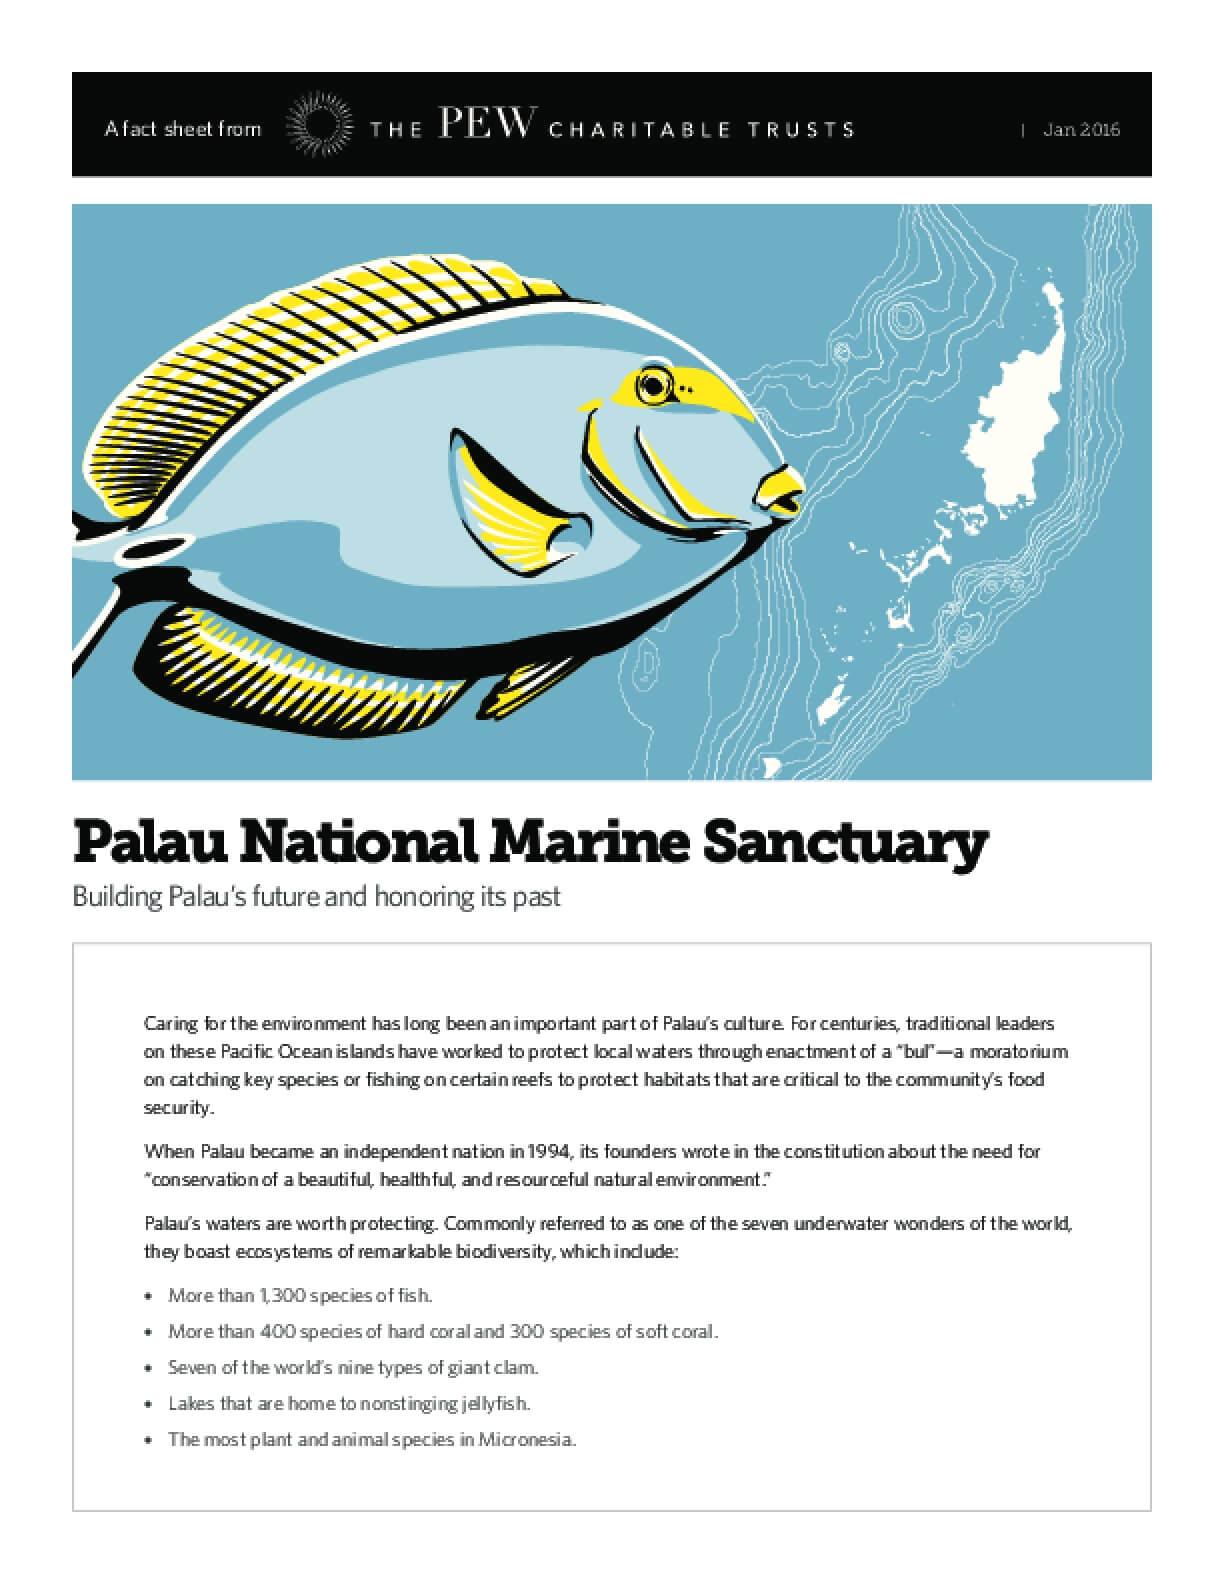 Palau National Marine Sanctuary: Building Palau's Future and Honoring Its Past